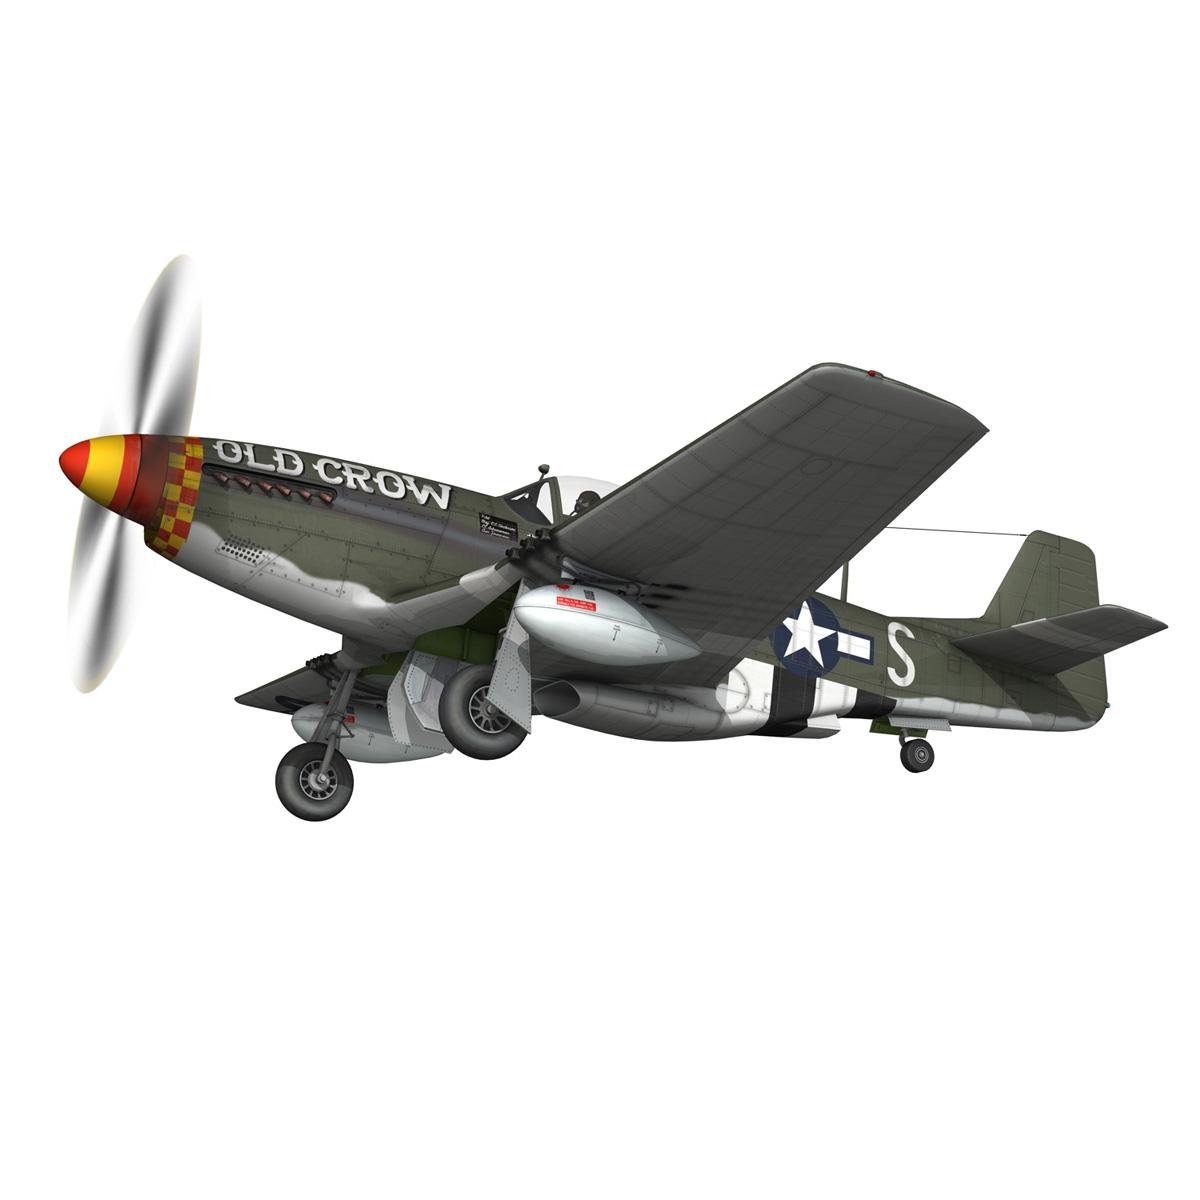 north american p-51d mustang – old crow 3d model fbx c4d lwo obj 273341